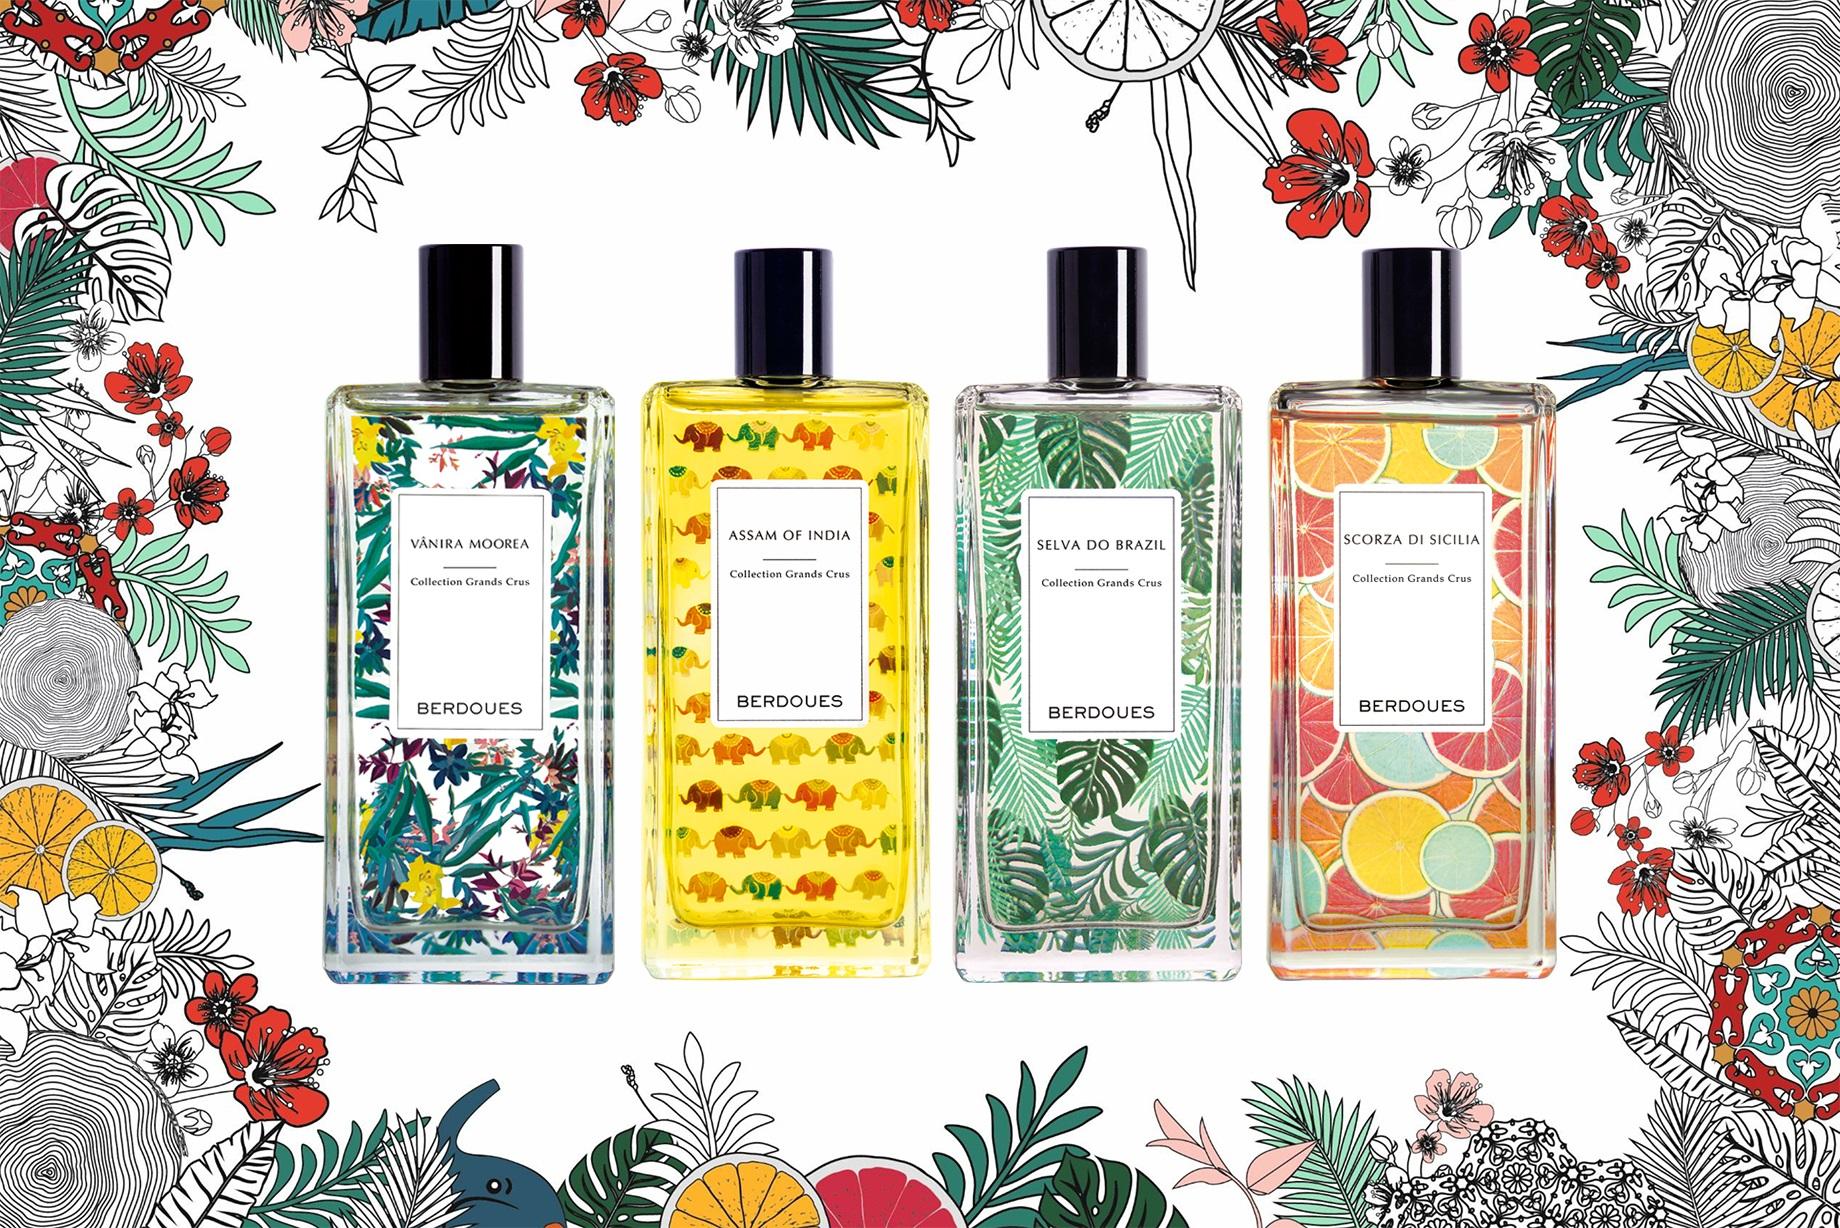 Scentbird Introduces Maison Berdoues: Creators of Fine Fragrances